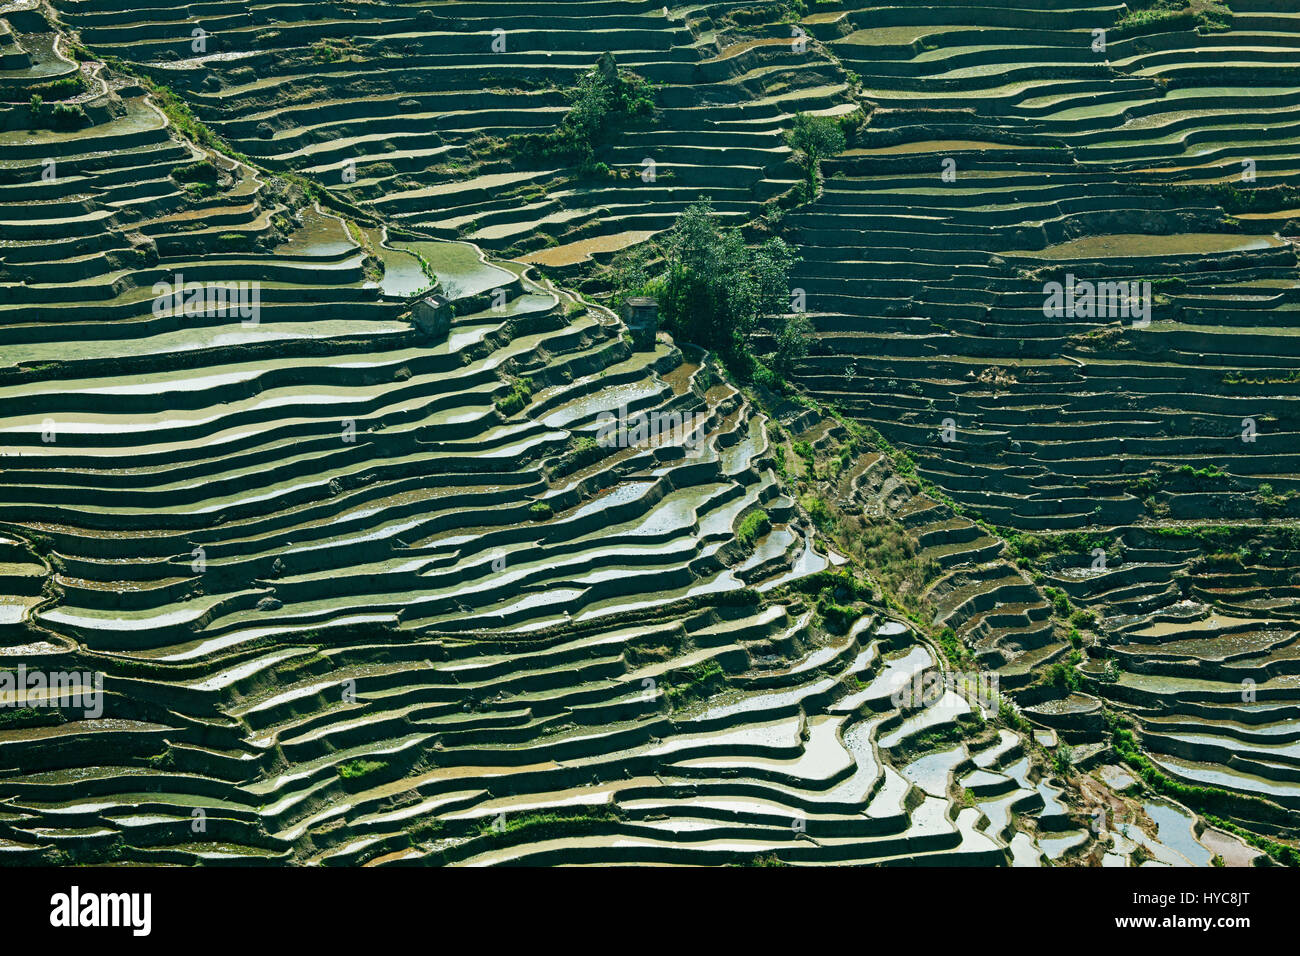 Campo De Arroz Terraza Yunnan China Foto Imagen De Stock